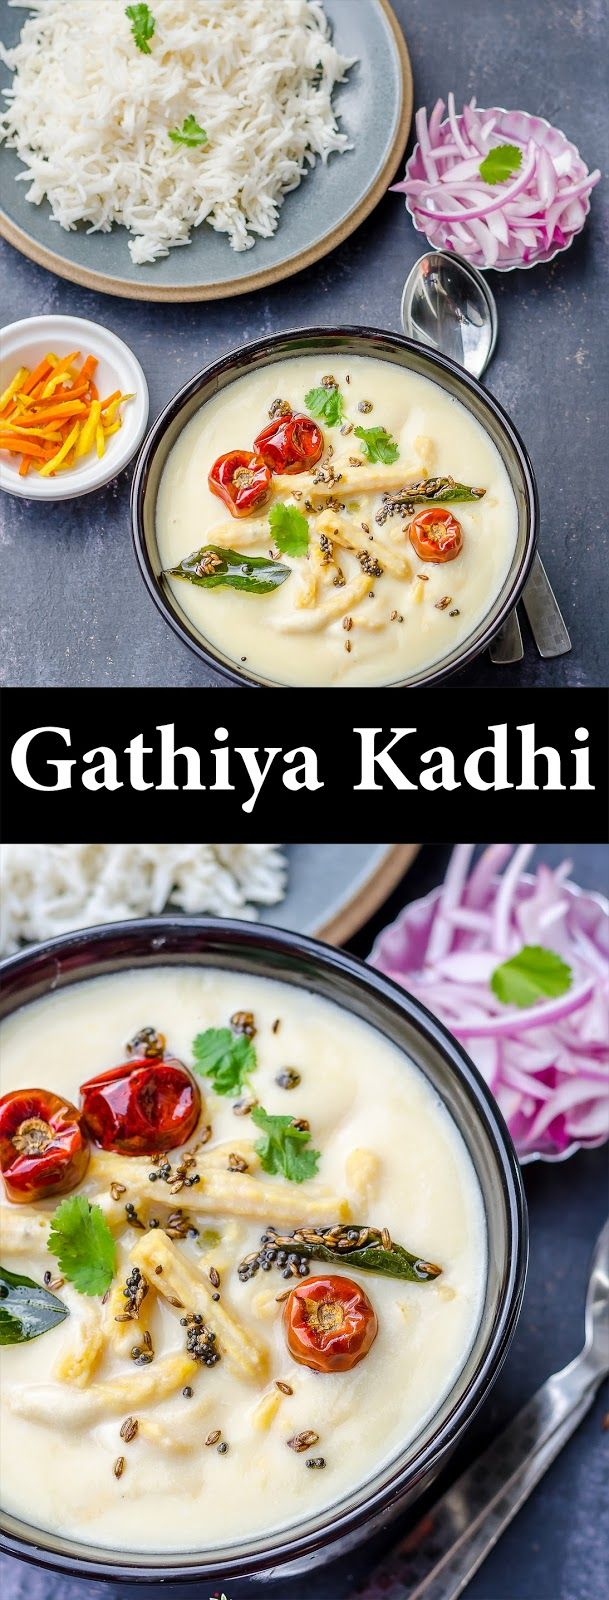 Blogging Marathon #73 Week 3 Day 2 Theme: Flavors of India Dish: Gathiya Waali Kadhi A tempting and comforting bowl of Kadhi...